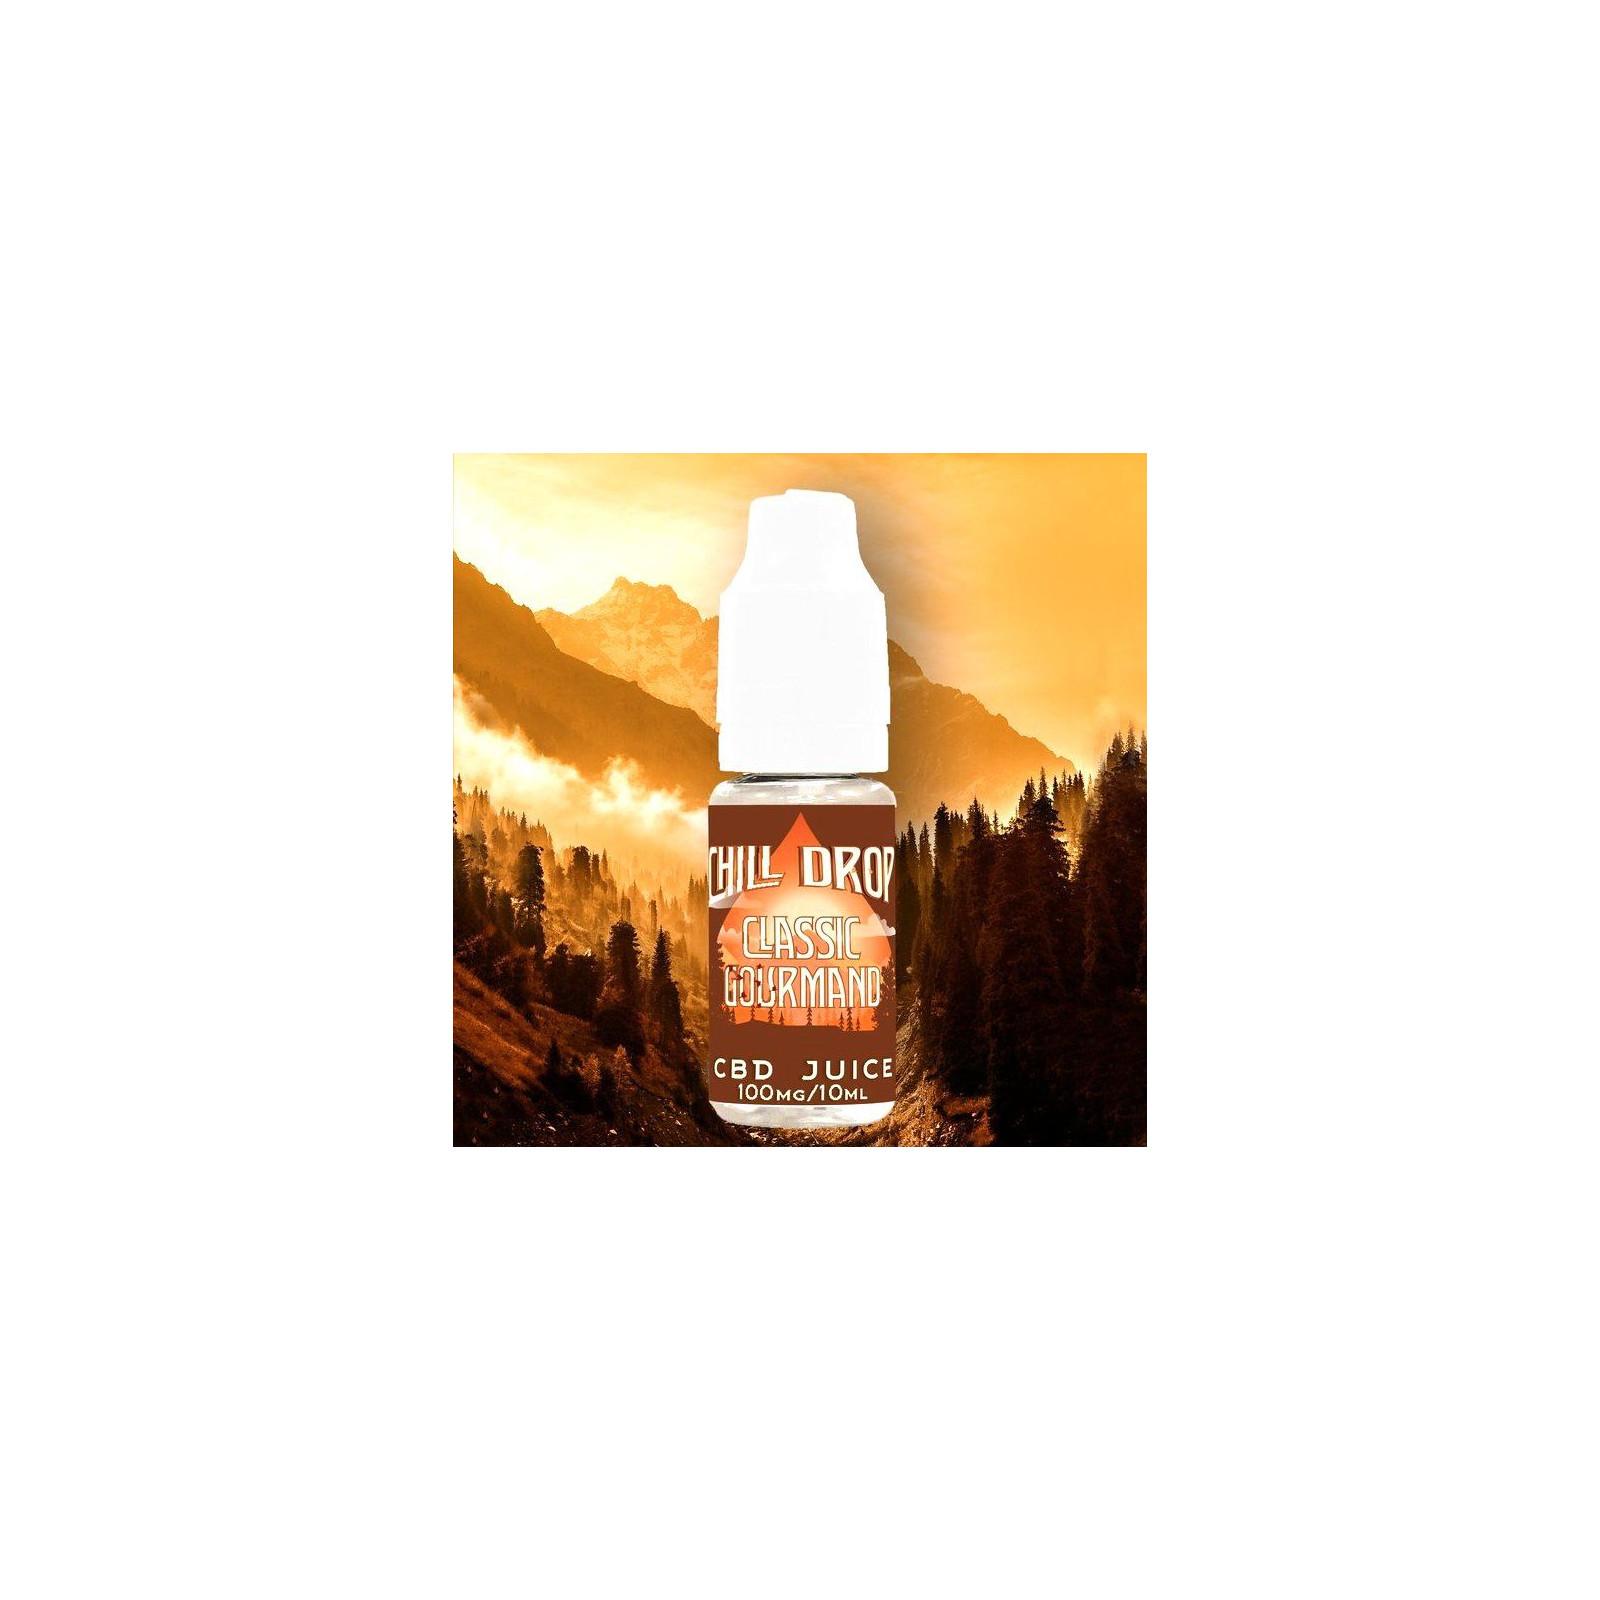 Classic Gourmand CBD - Chill Drop